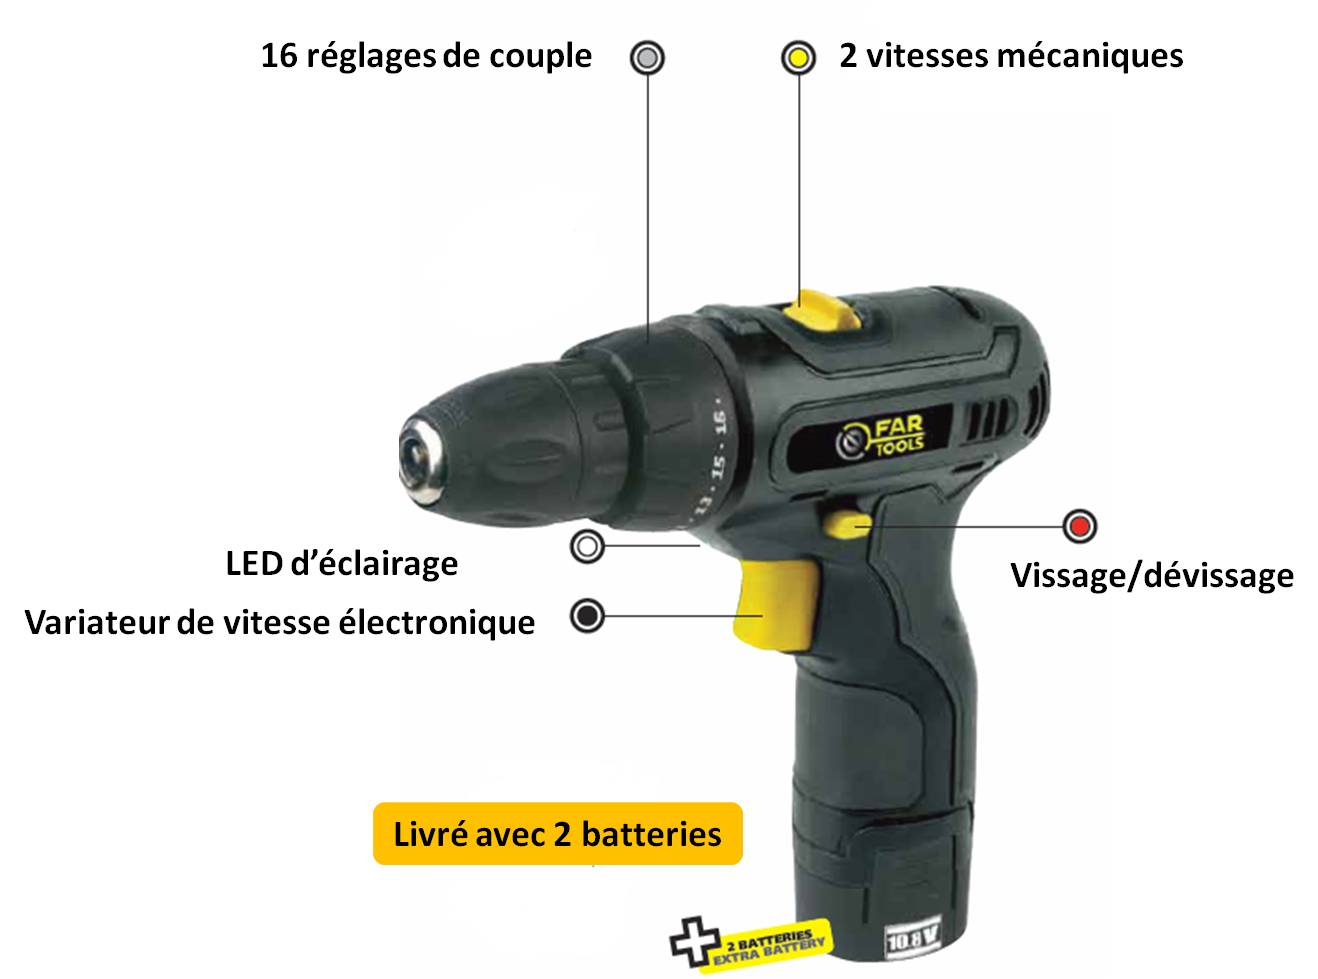 Visseuse sans fil 2 batteries li ion fartools li10 215411 ilya2too - Visseuse devisseuse sans fil ...